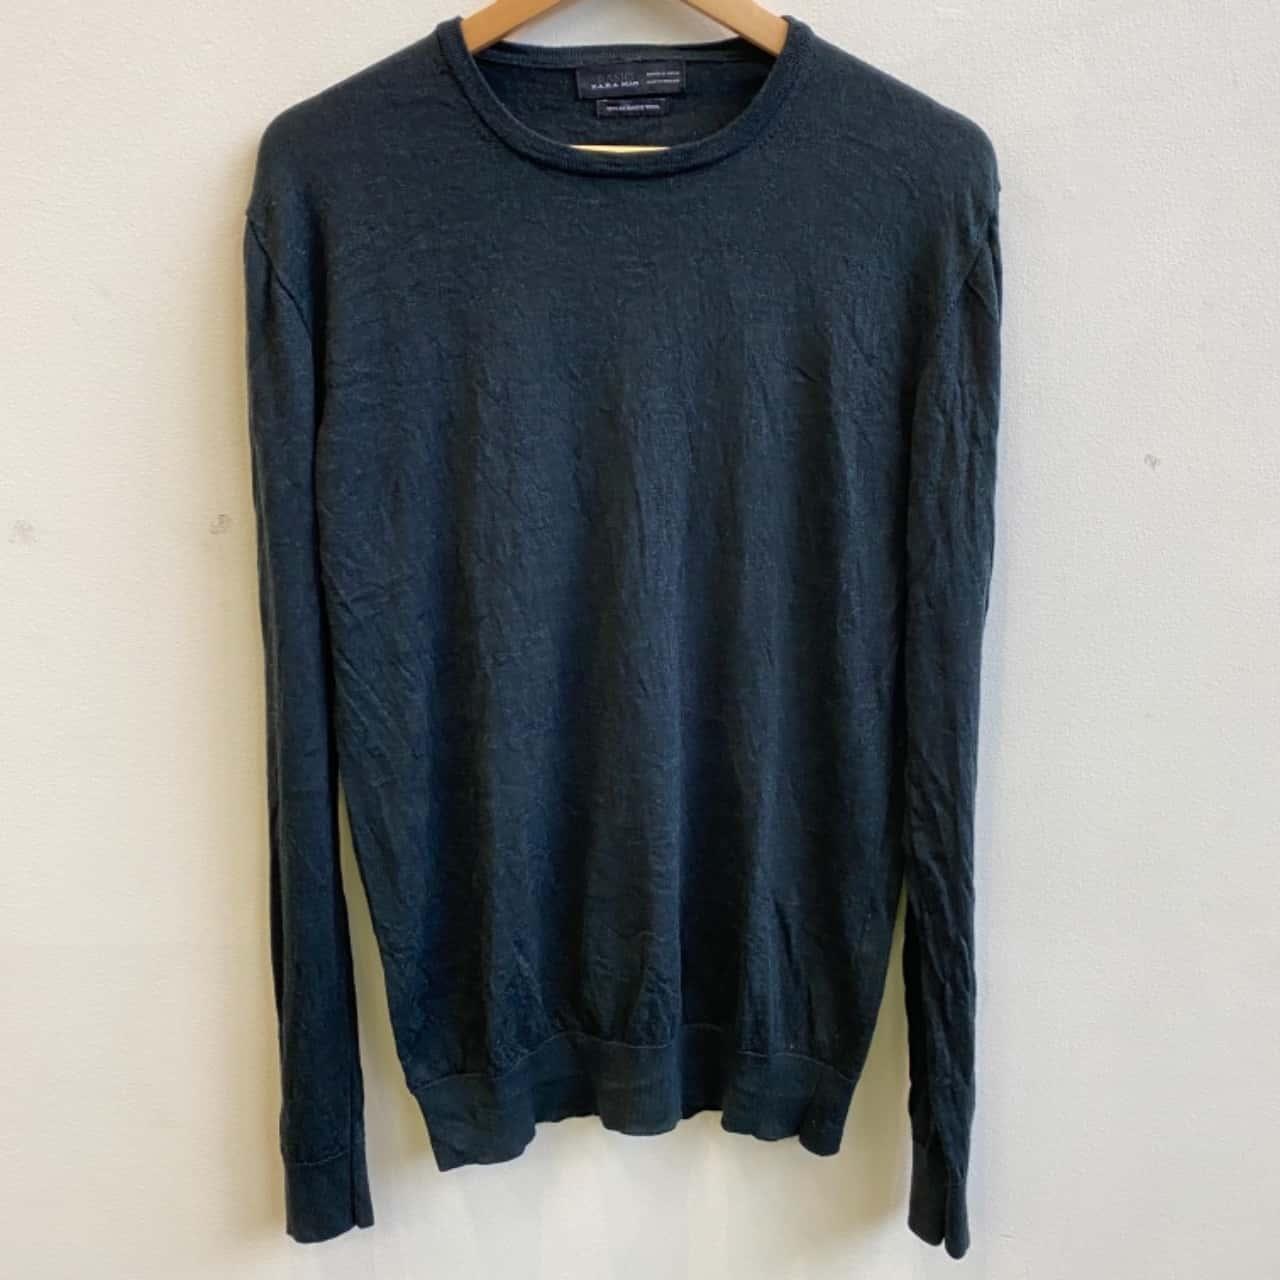 Zara Mens Basic Knit Wool Dark Green Jumper Size XL